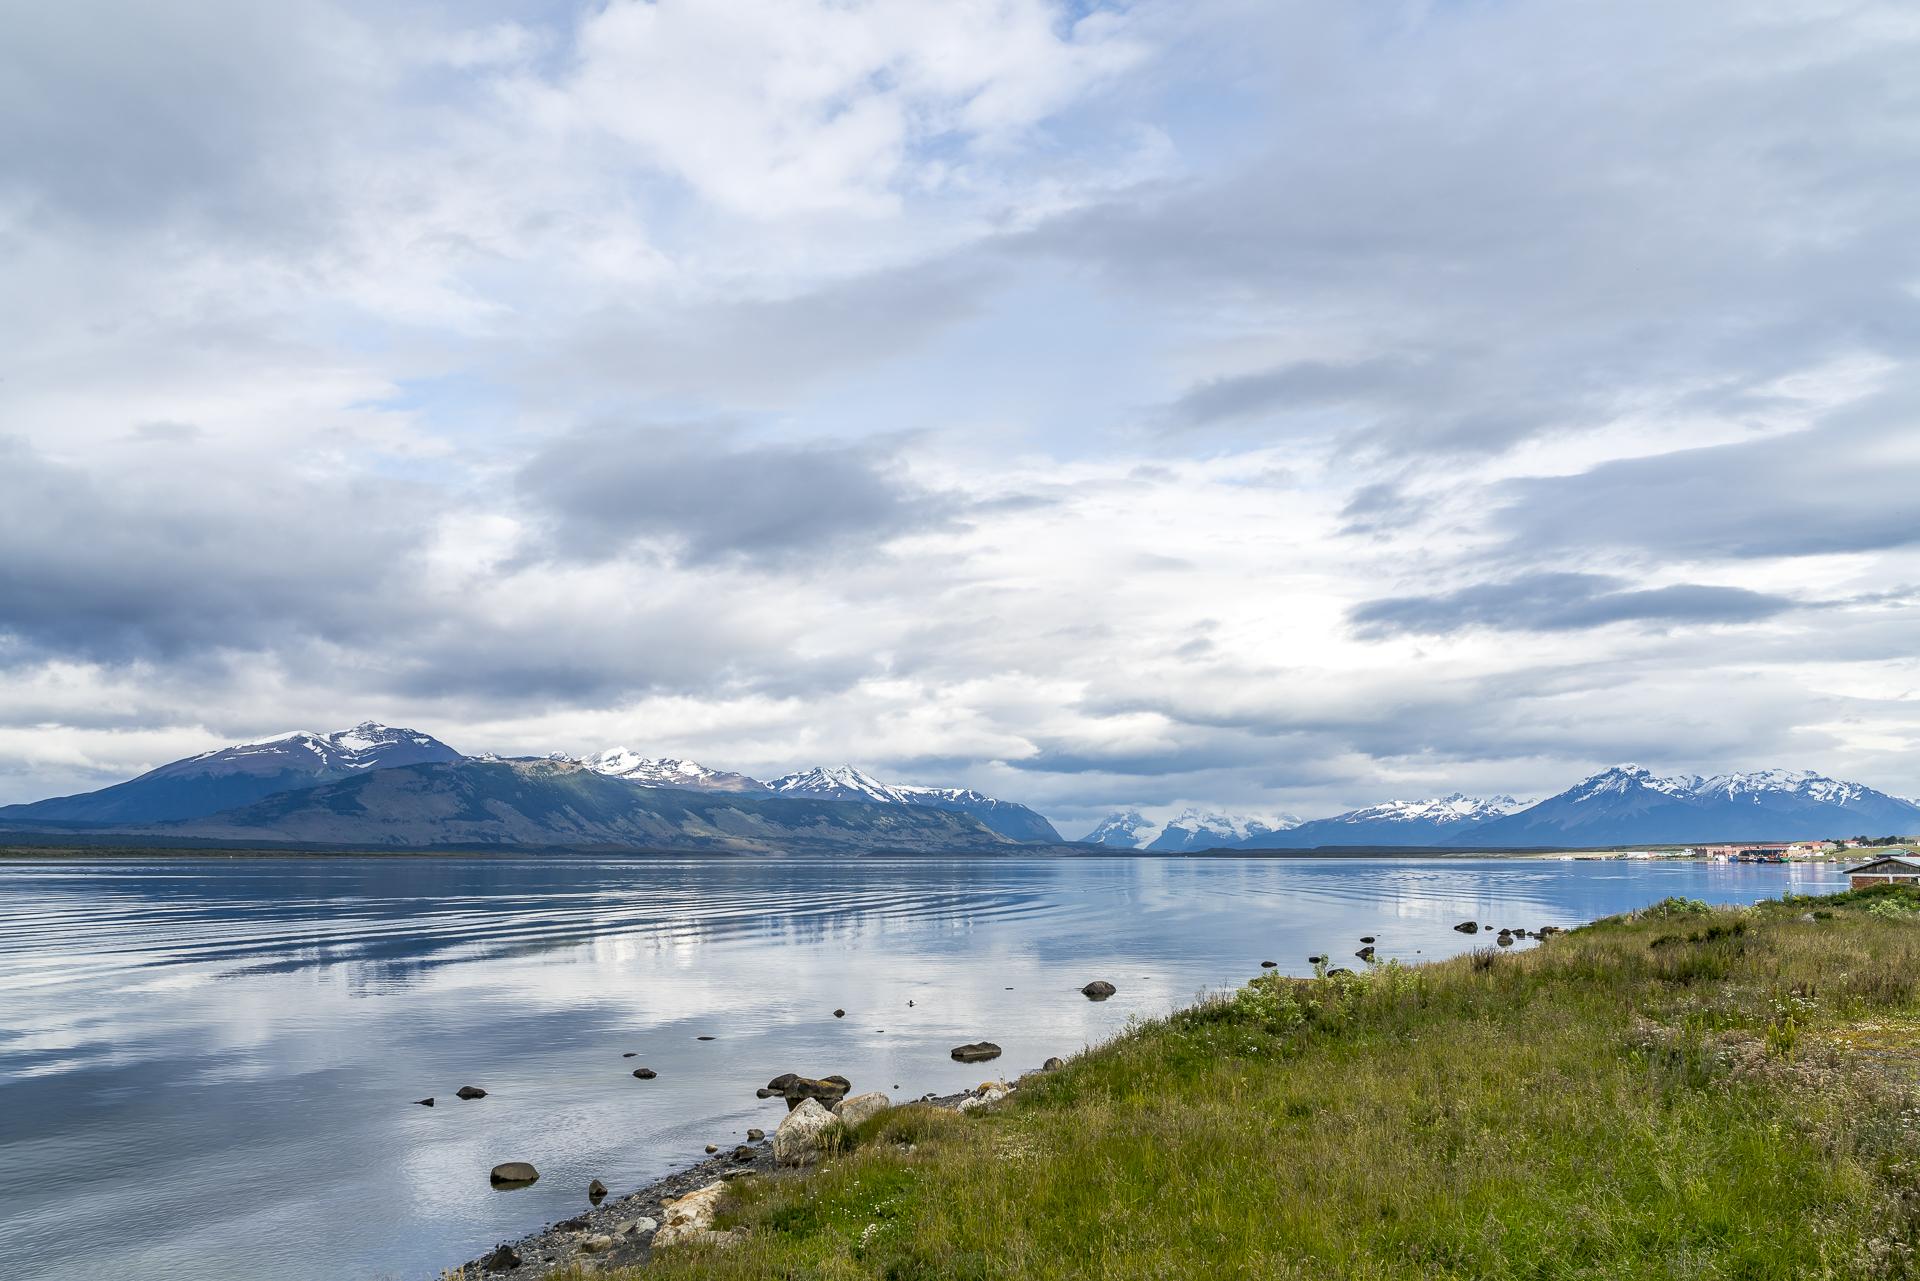 Erster Stop unserer Patagonien Roadtrip: Puerto Natales